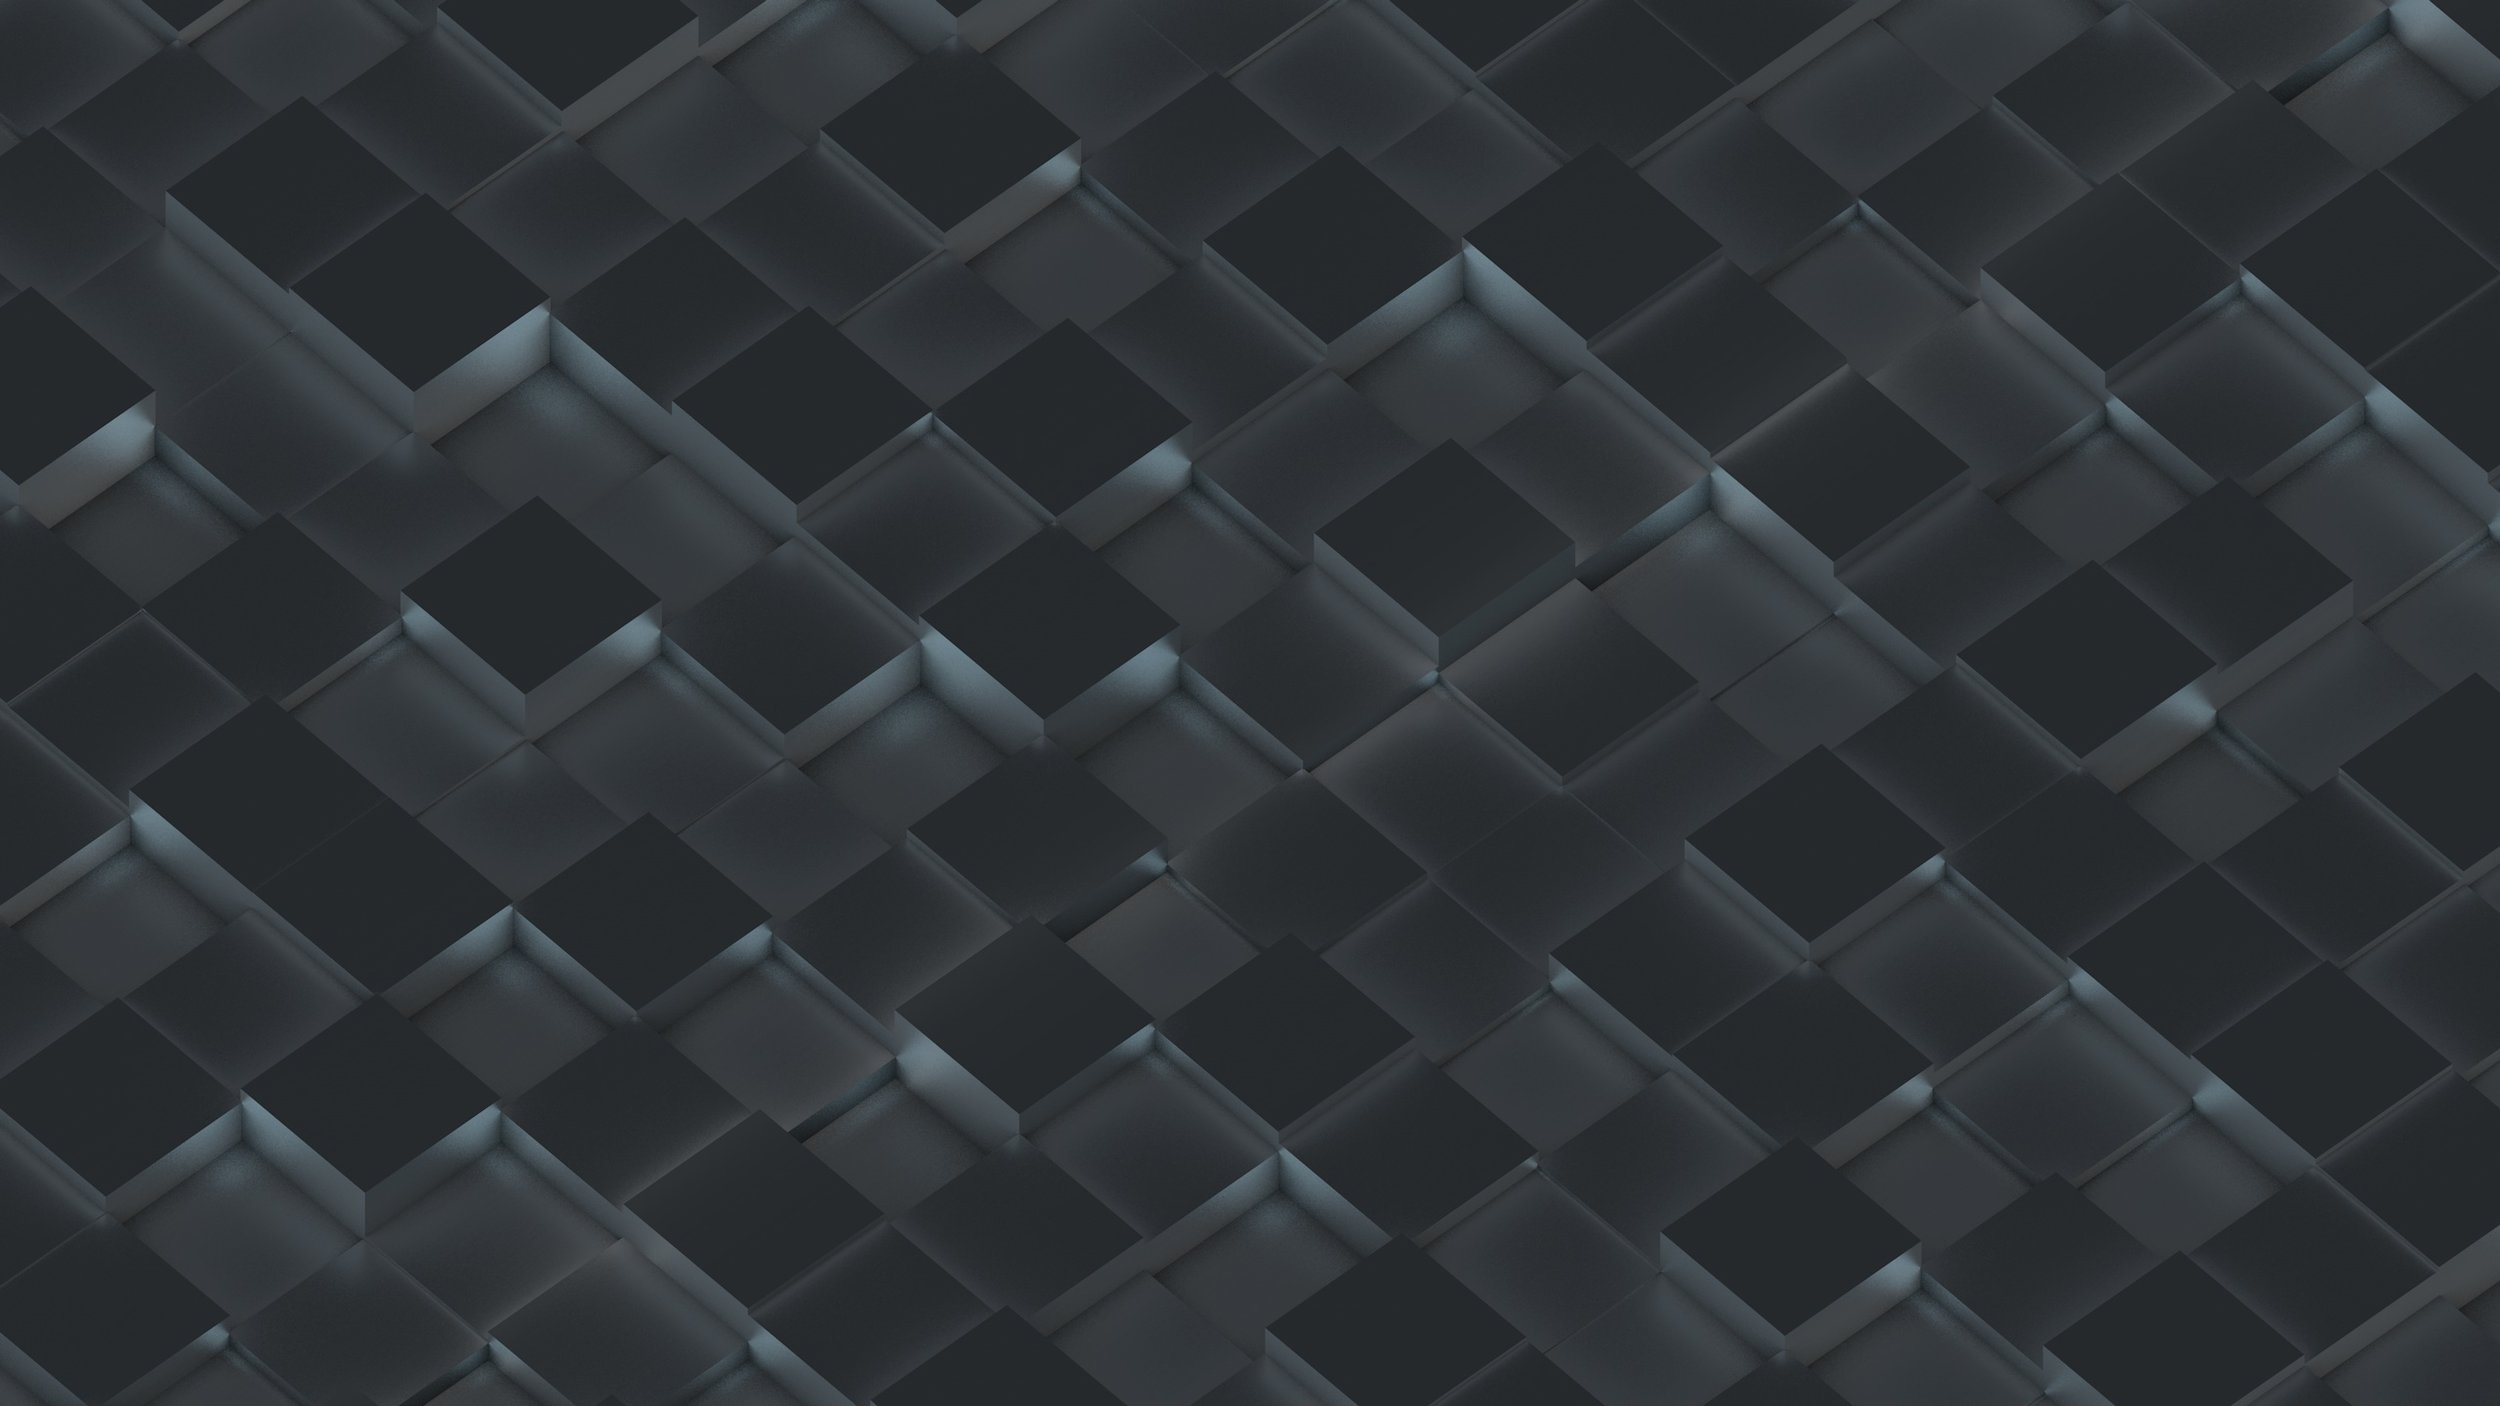 Abstract Cubes - 2560x1440 wallpaper